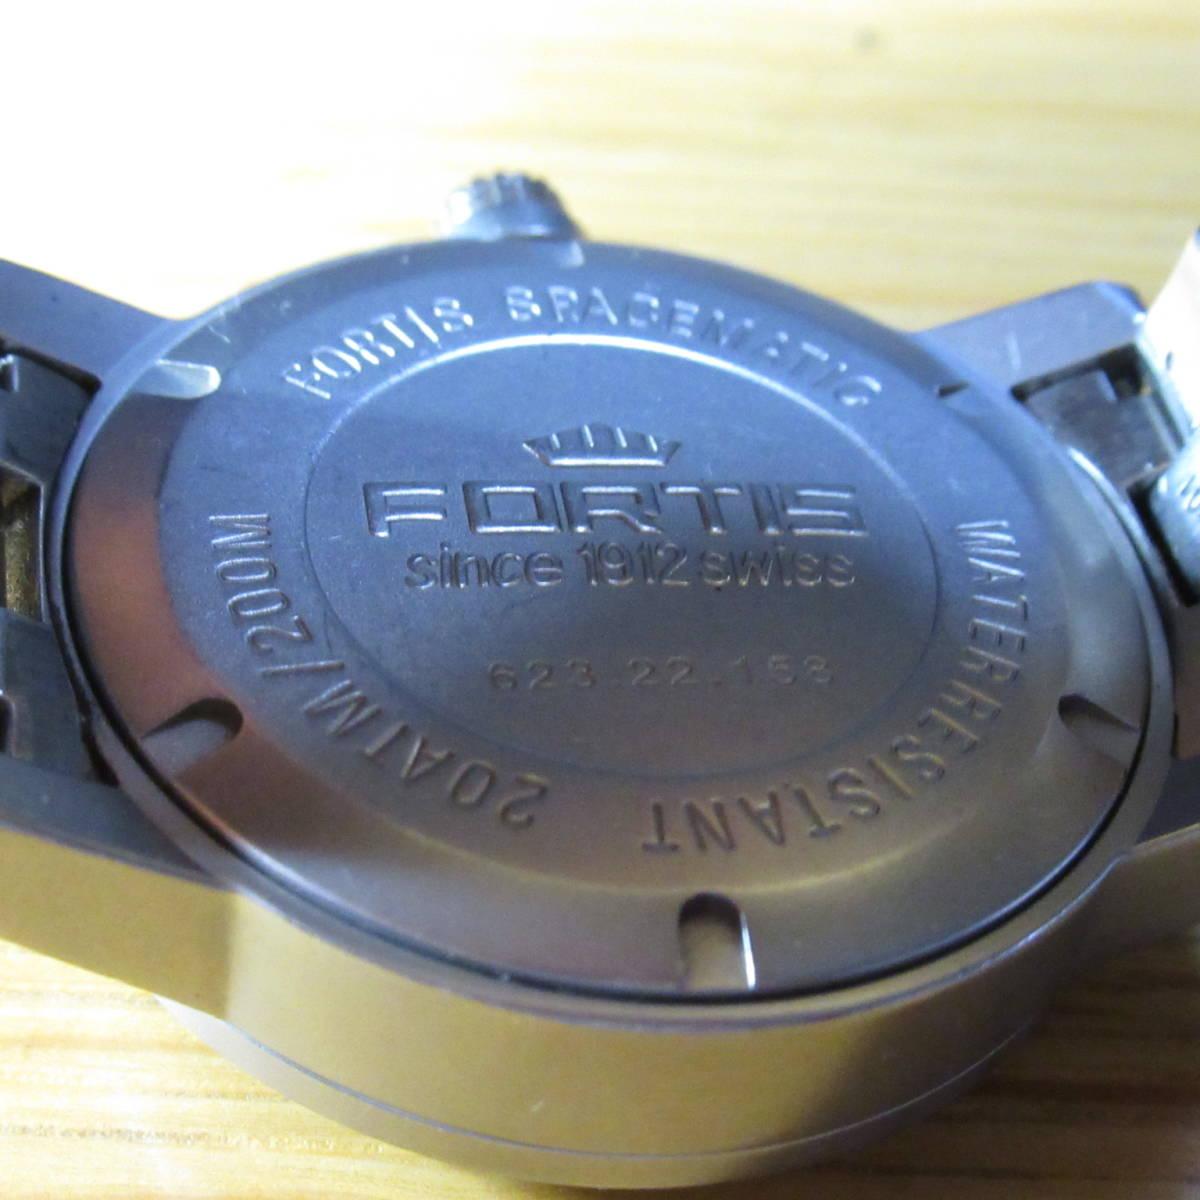 FORTIS フォルティス 自動巻き 腕時計 SPACEMATIC スペースマチック スペースマティック 黒文字盤 623.22.158 稼働品 【現状販売品】_画像5